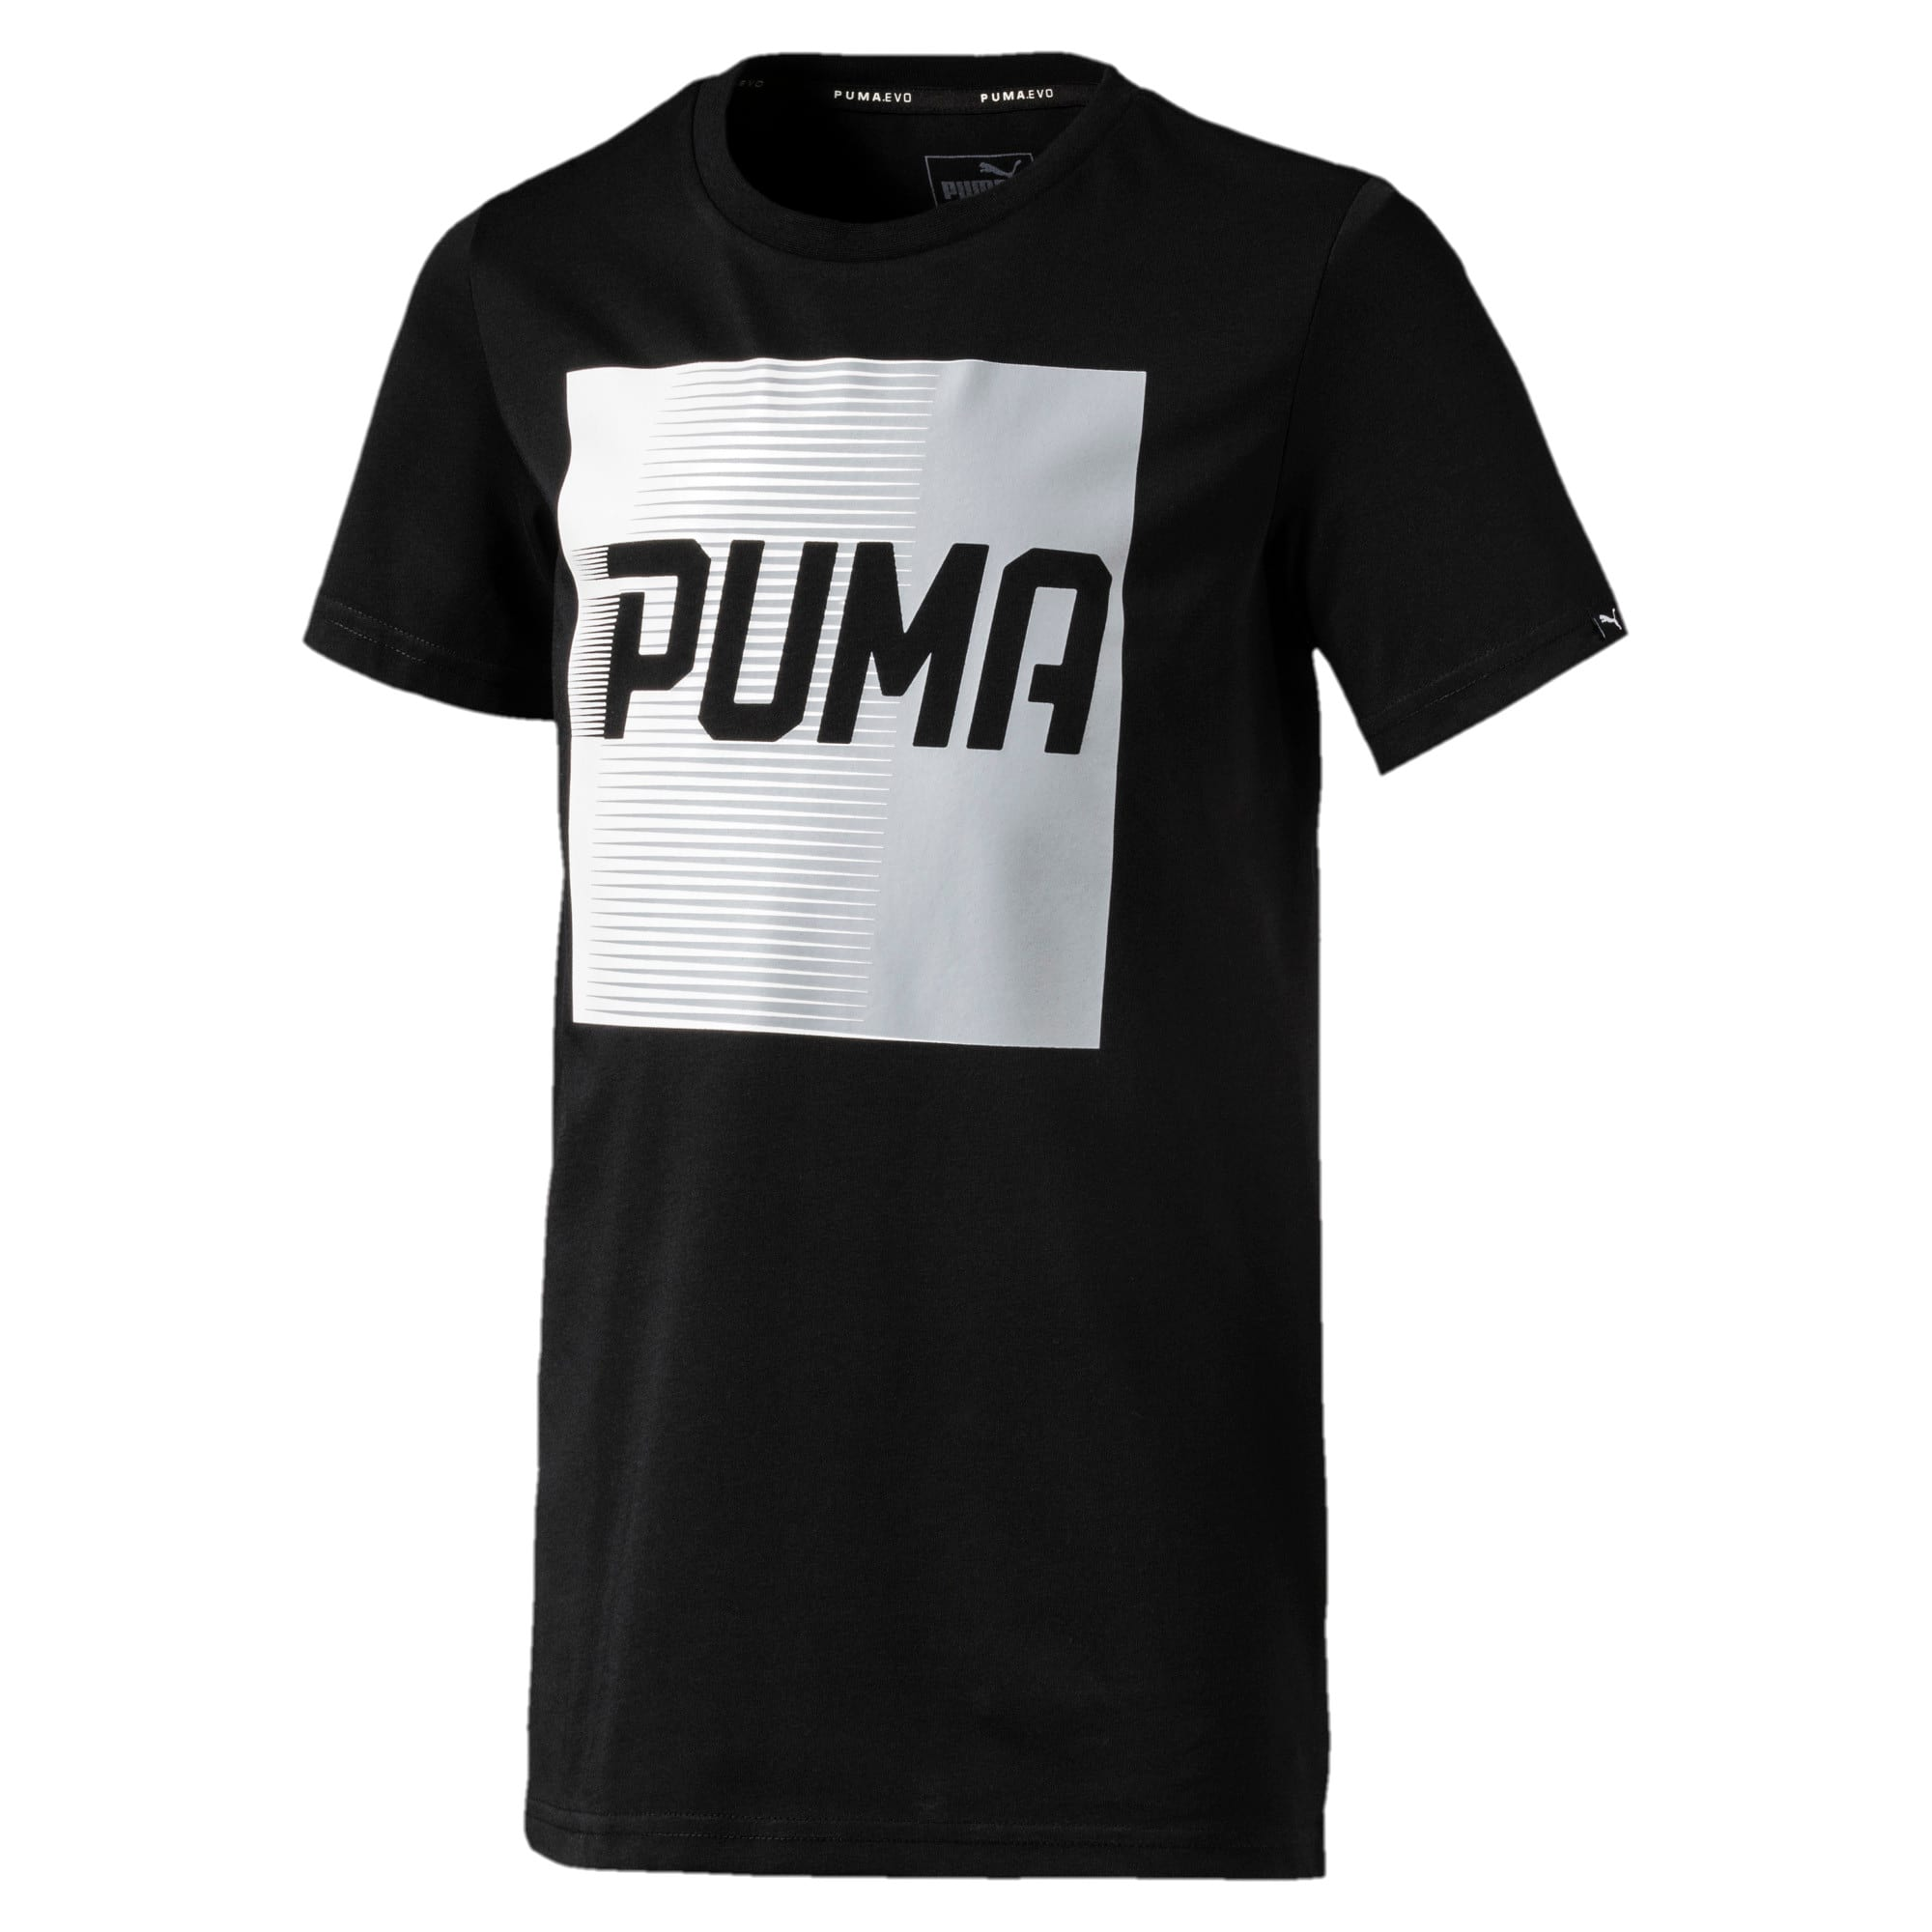 Thumbnail 1 of Boys' Evo Graphic T-Shirt, Cotton Black, medium-IND